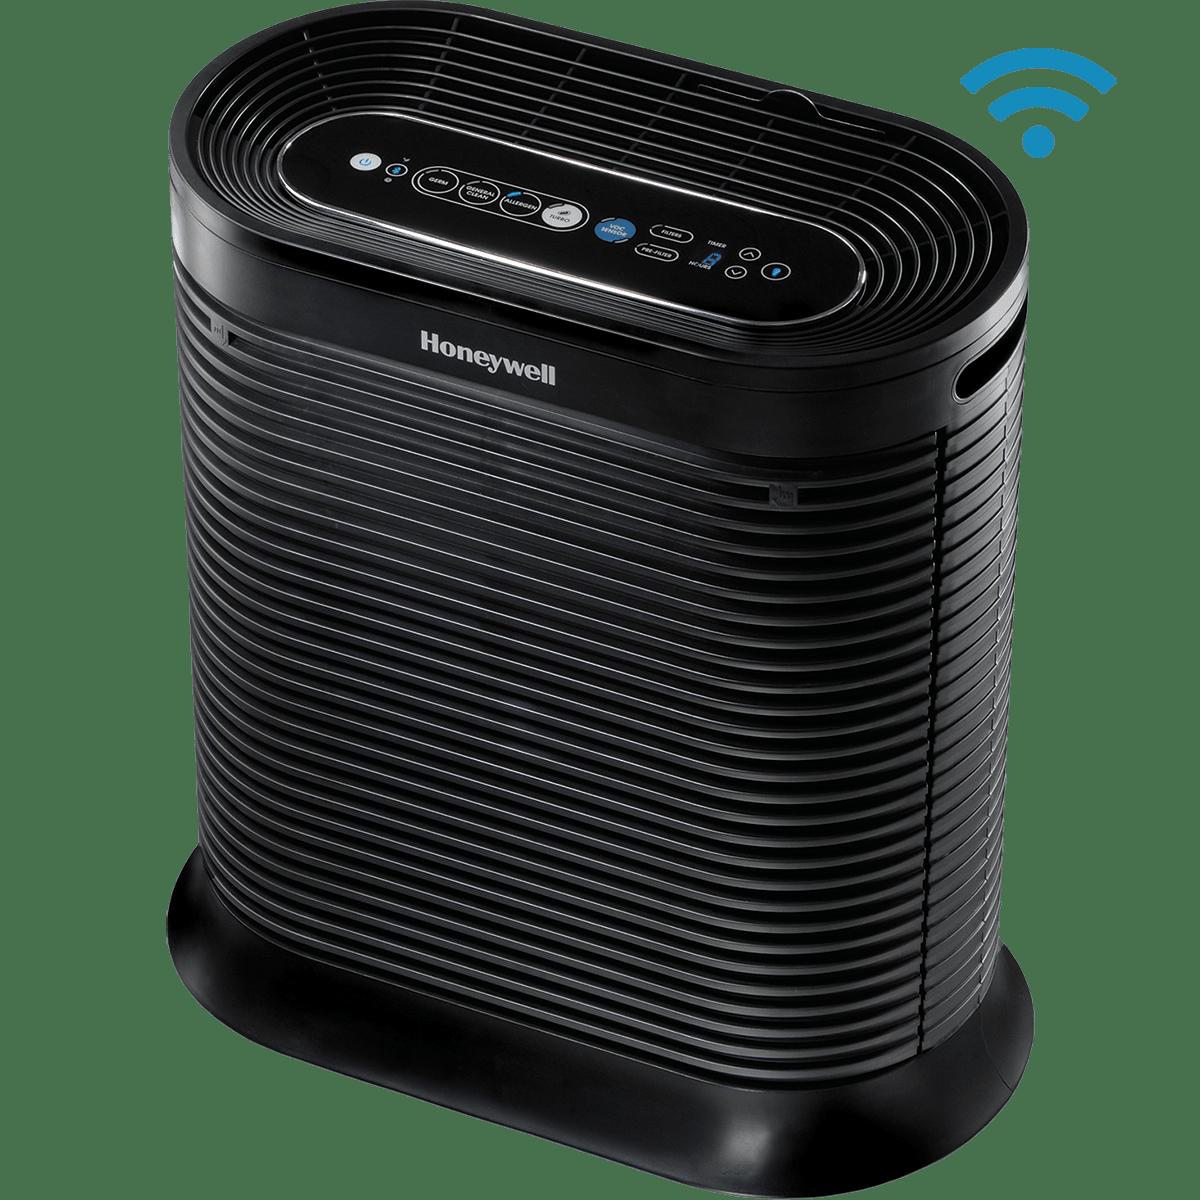 Honeywell HPA250B Bluetooth HEPA Air Purifier ho5507